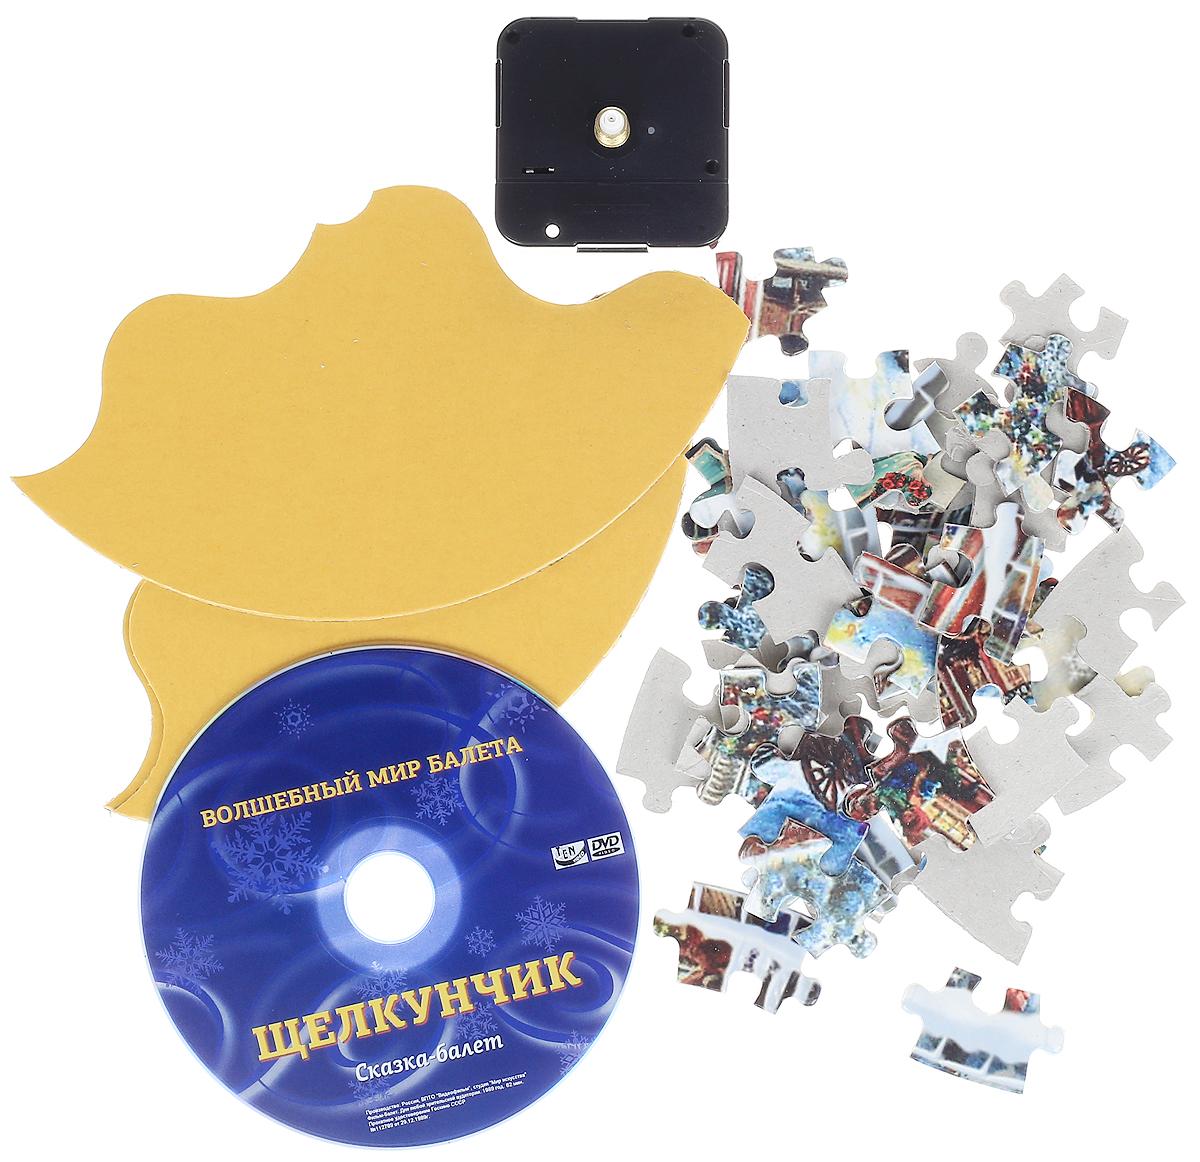 Новогодний сувенир (Часы-puzzle + DVD Щелкунчик. Волшебный мир балета) Волшебный мир балета